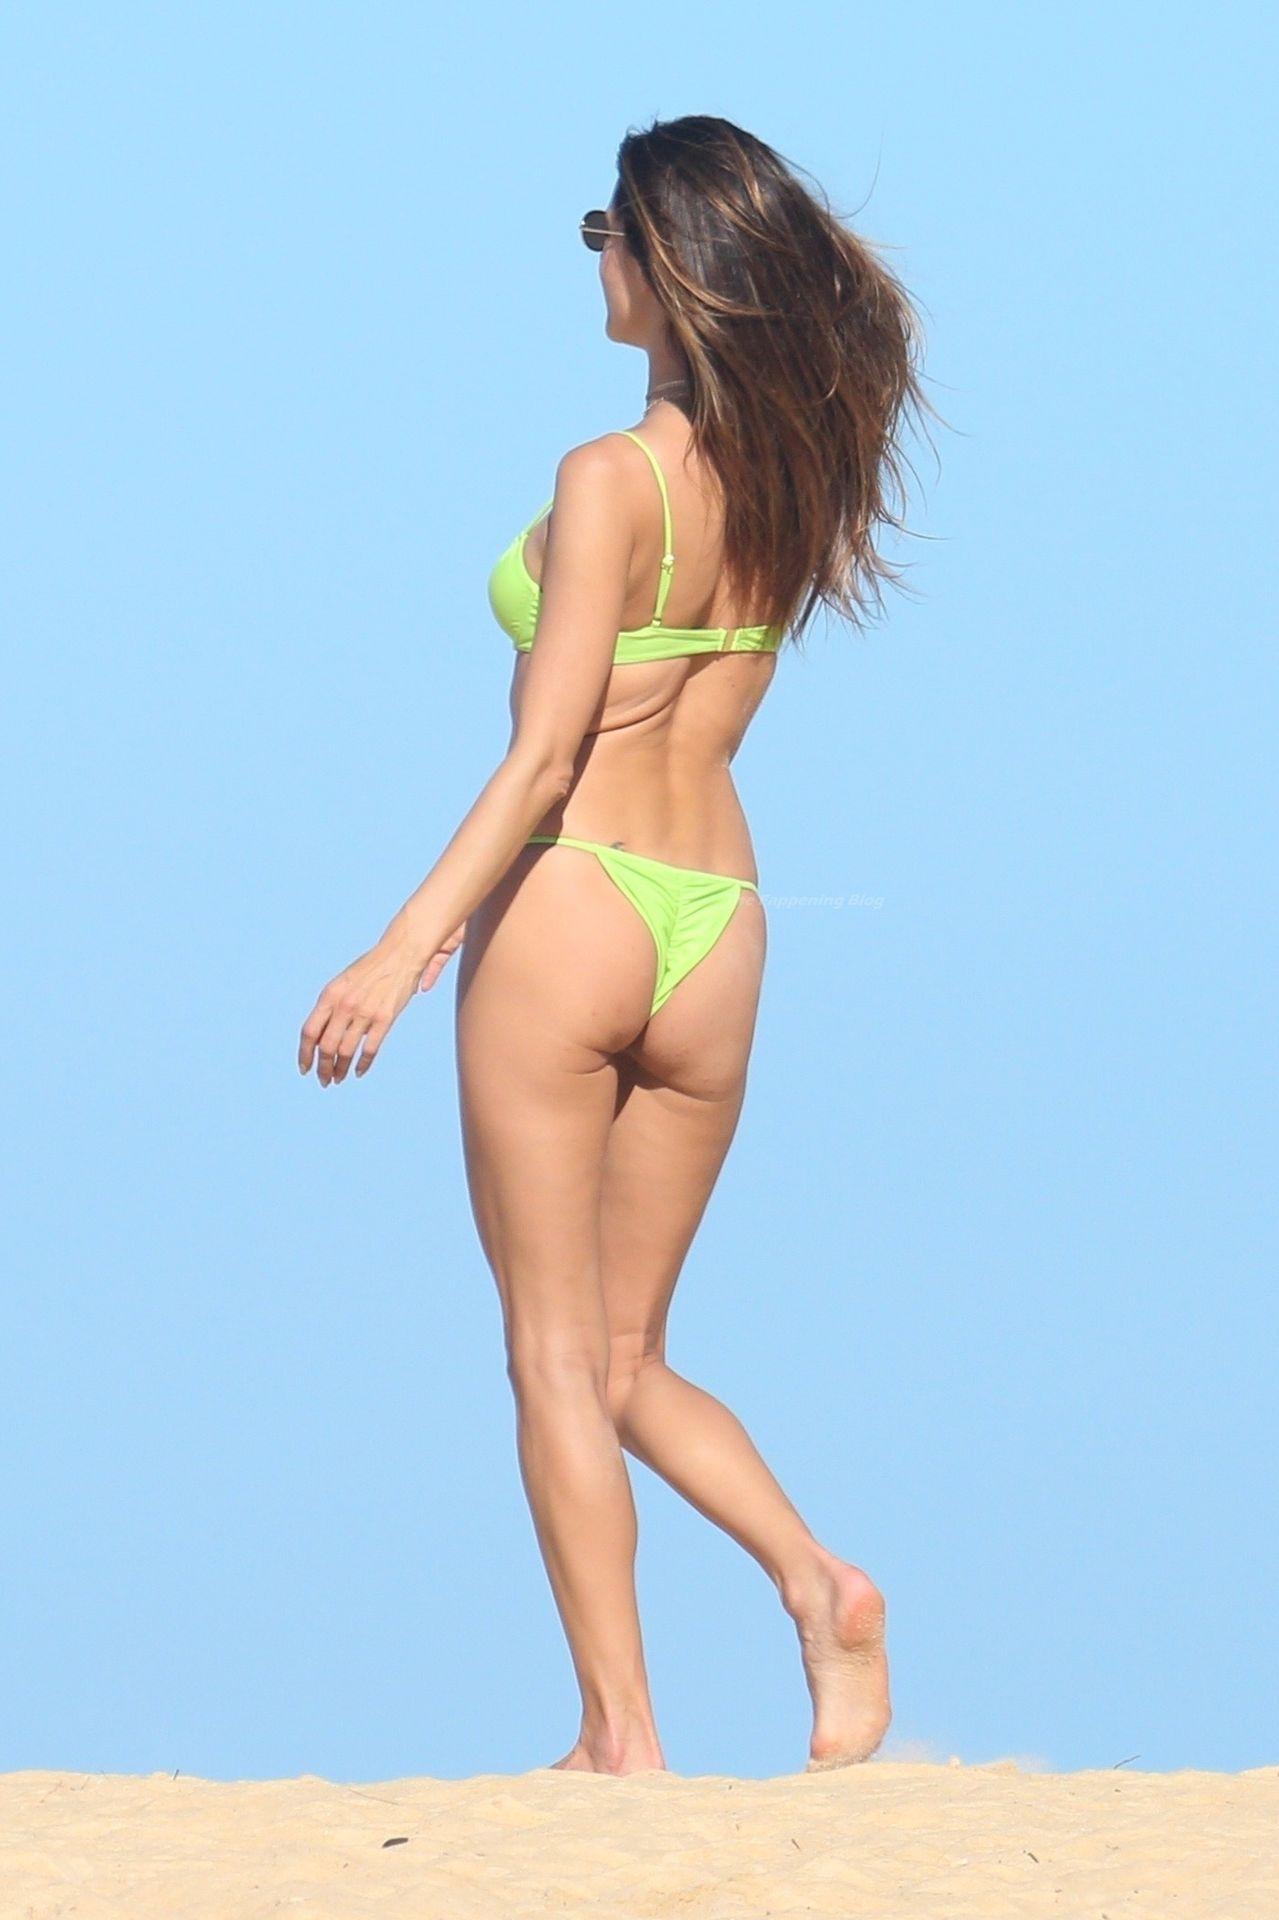 Alessandra-Ambrosio-Sexy-The-Fappening-Blog-991.jpg